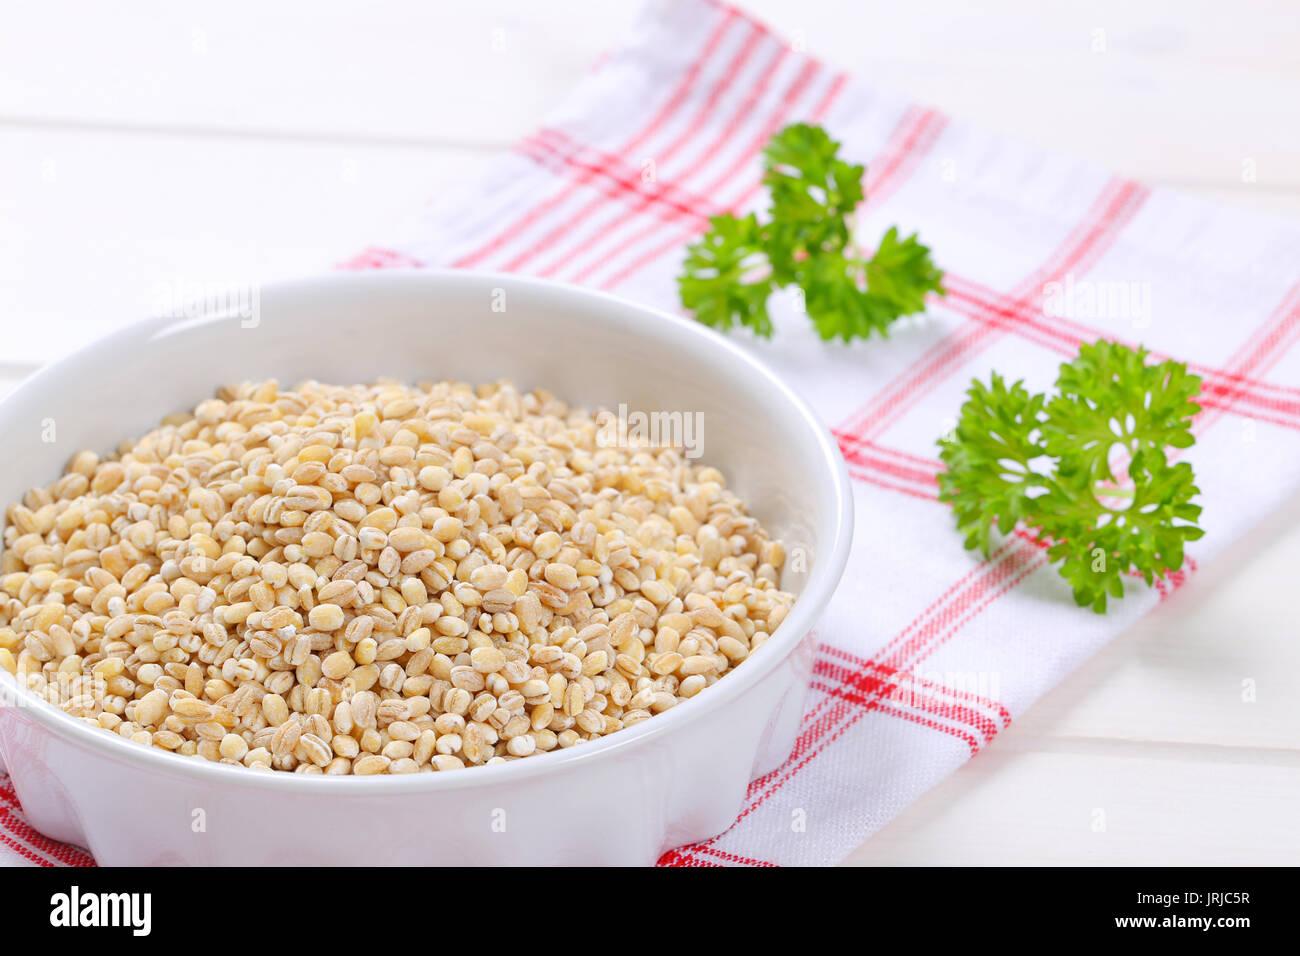 bowl of pearl barley on checkered dishtowel - close up - Stock Image